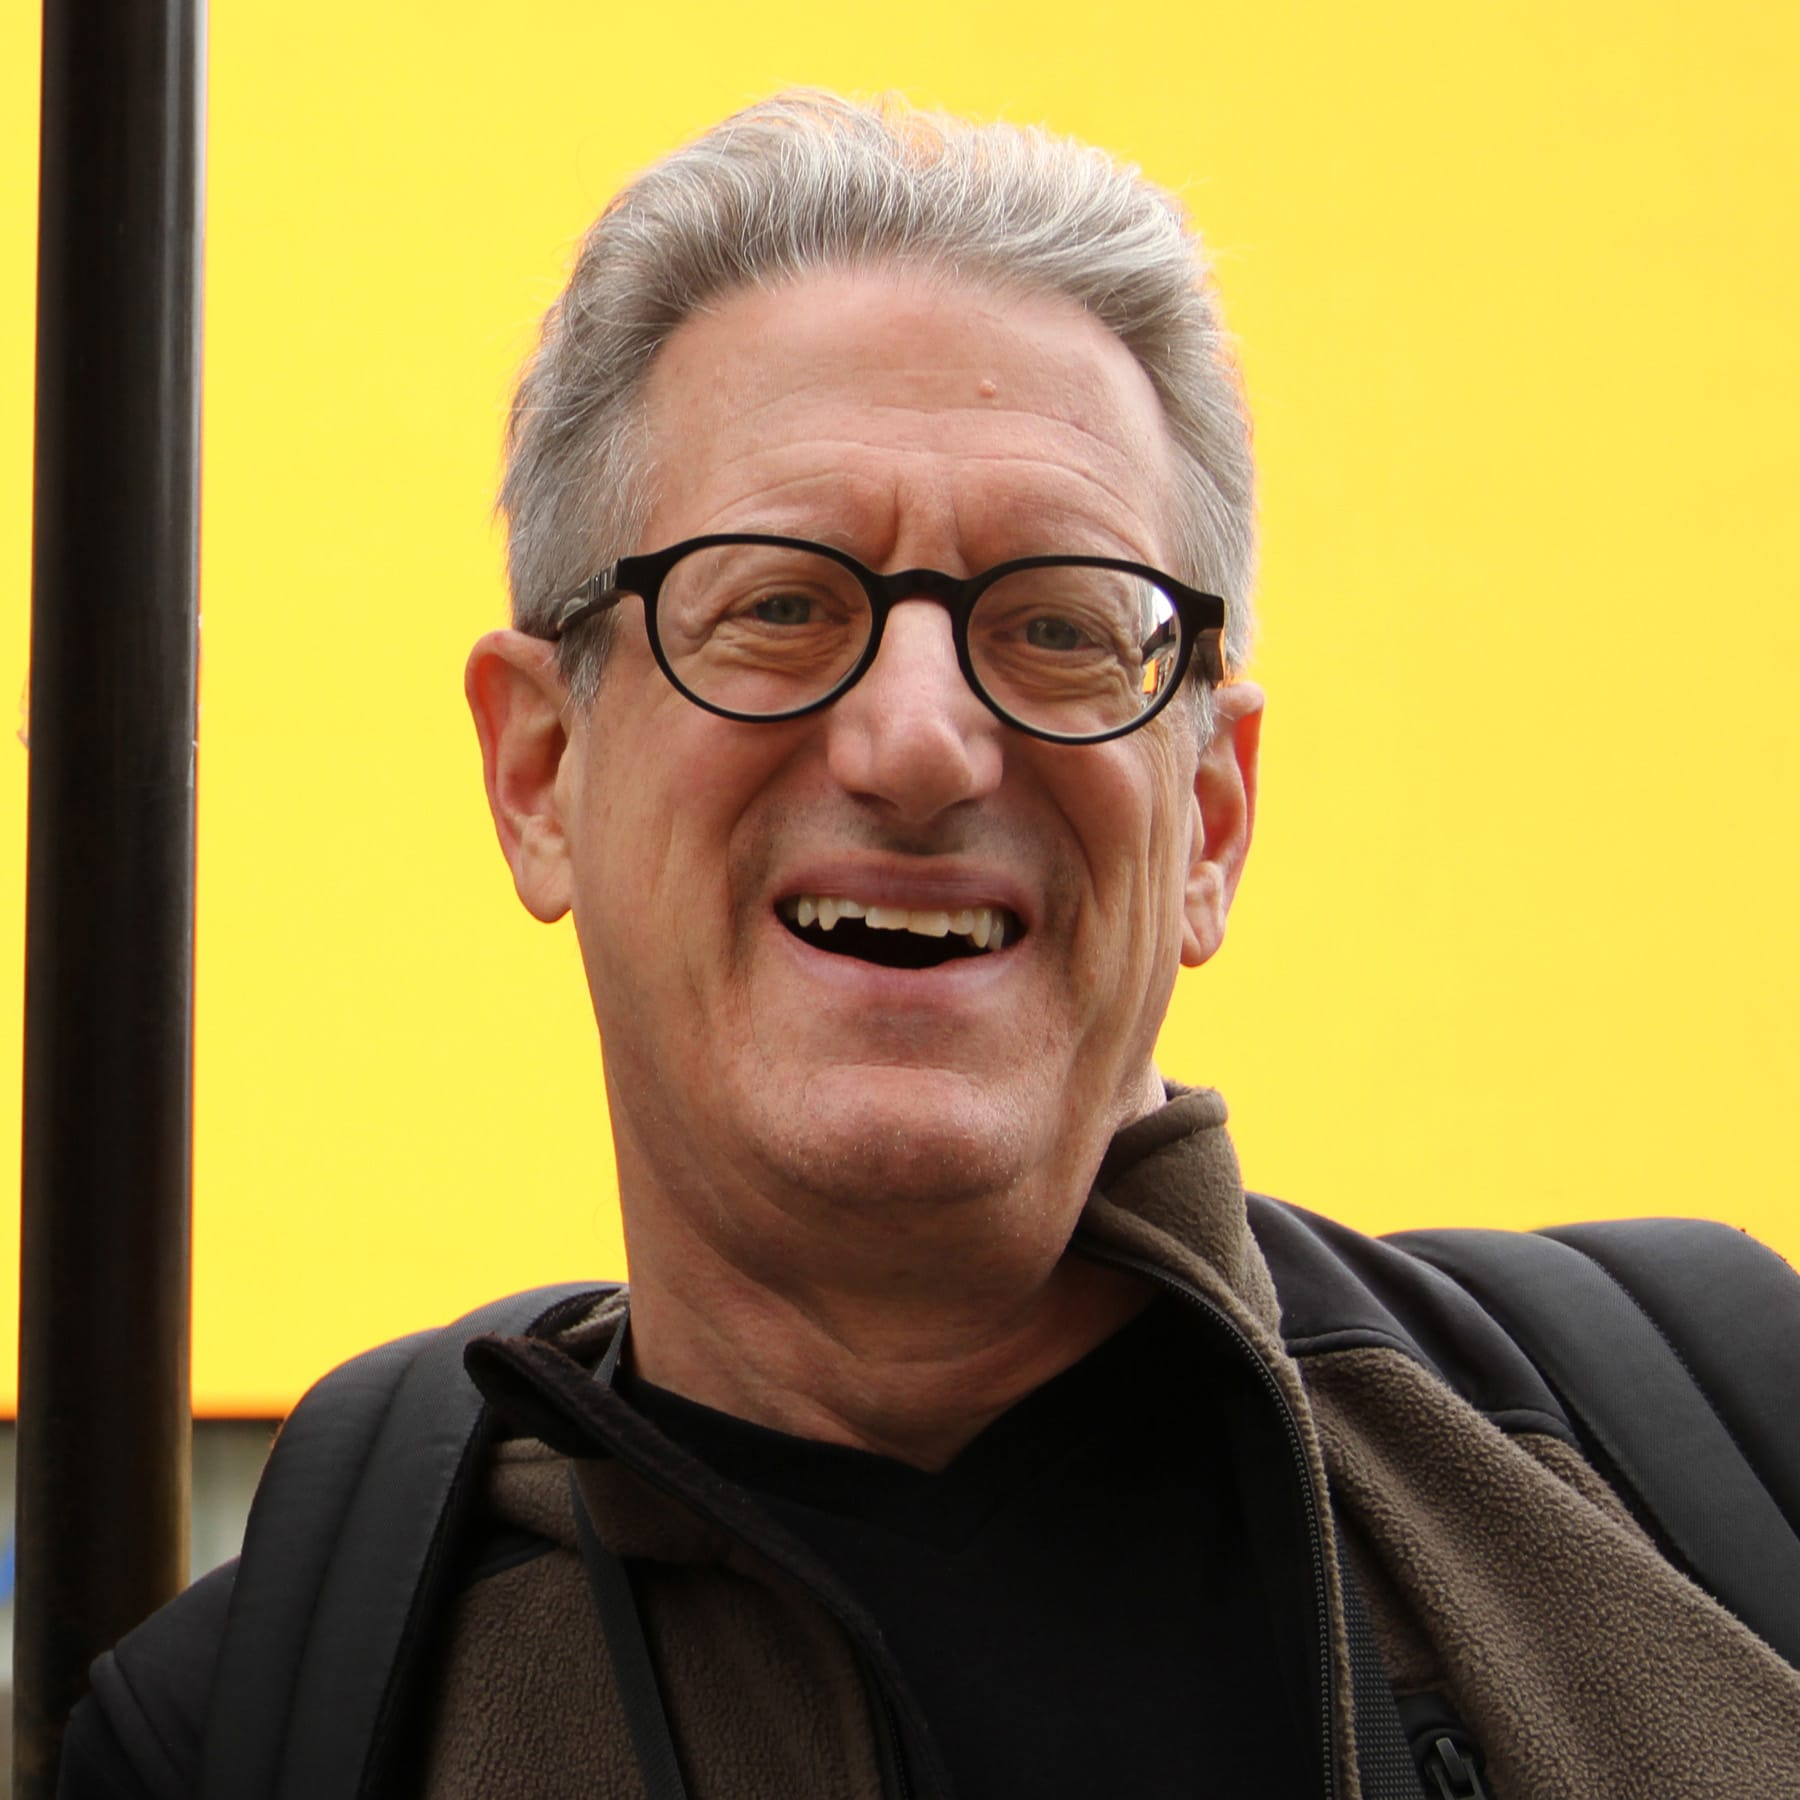 Richard Bram